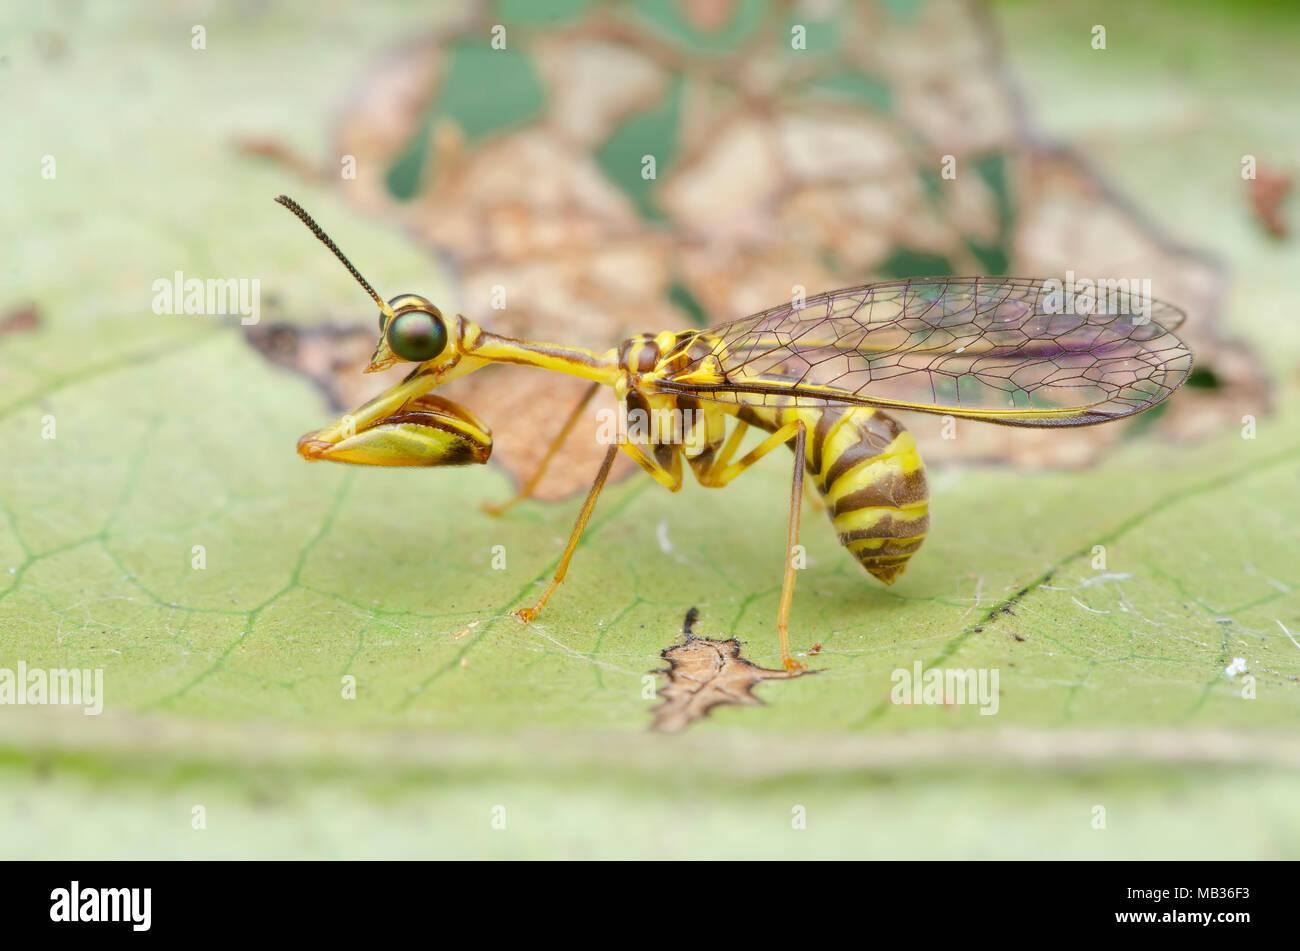 Mantid florfliegen auf grünes Blatt, Malaysia Arten. Stockbild